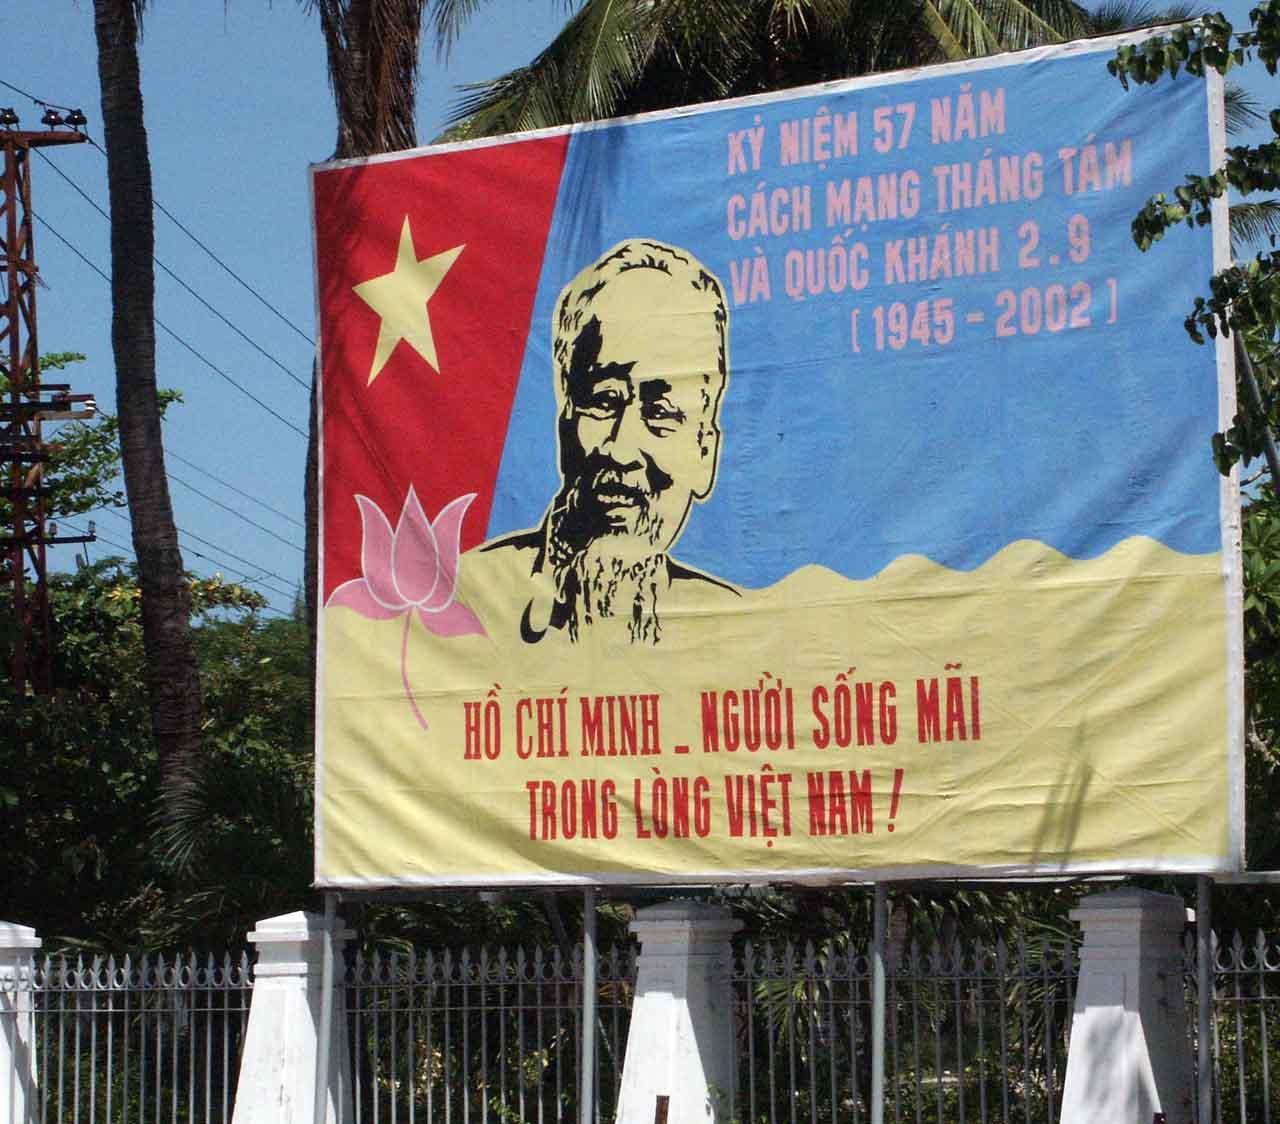 Banner in Hoi An Vietnam